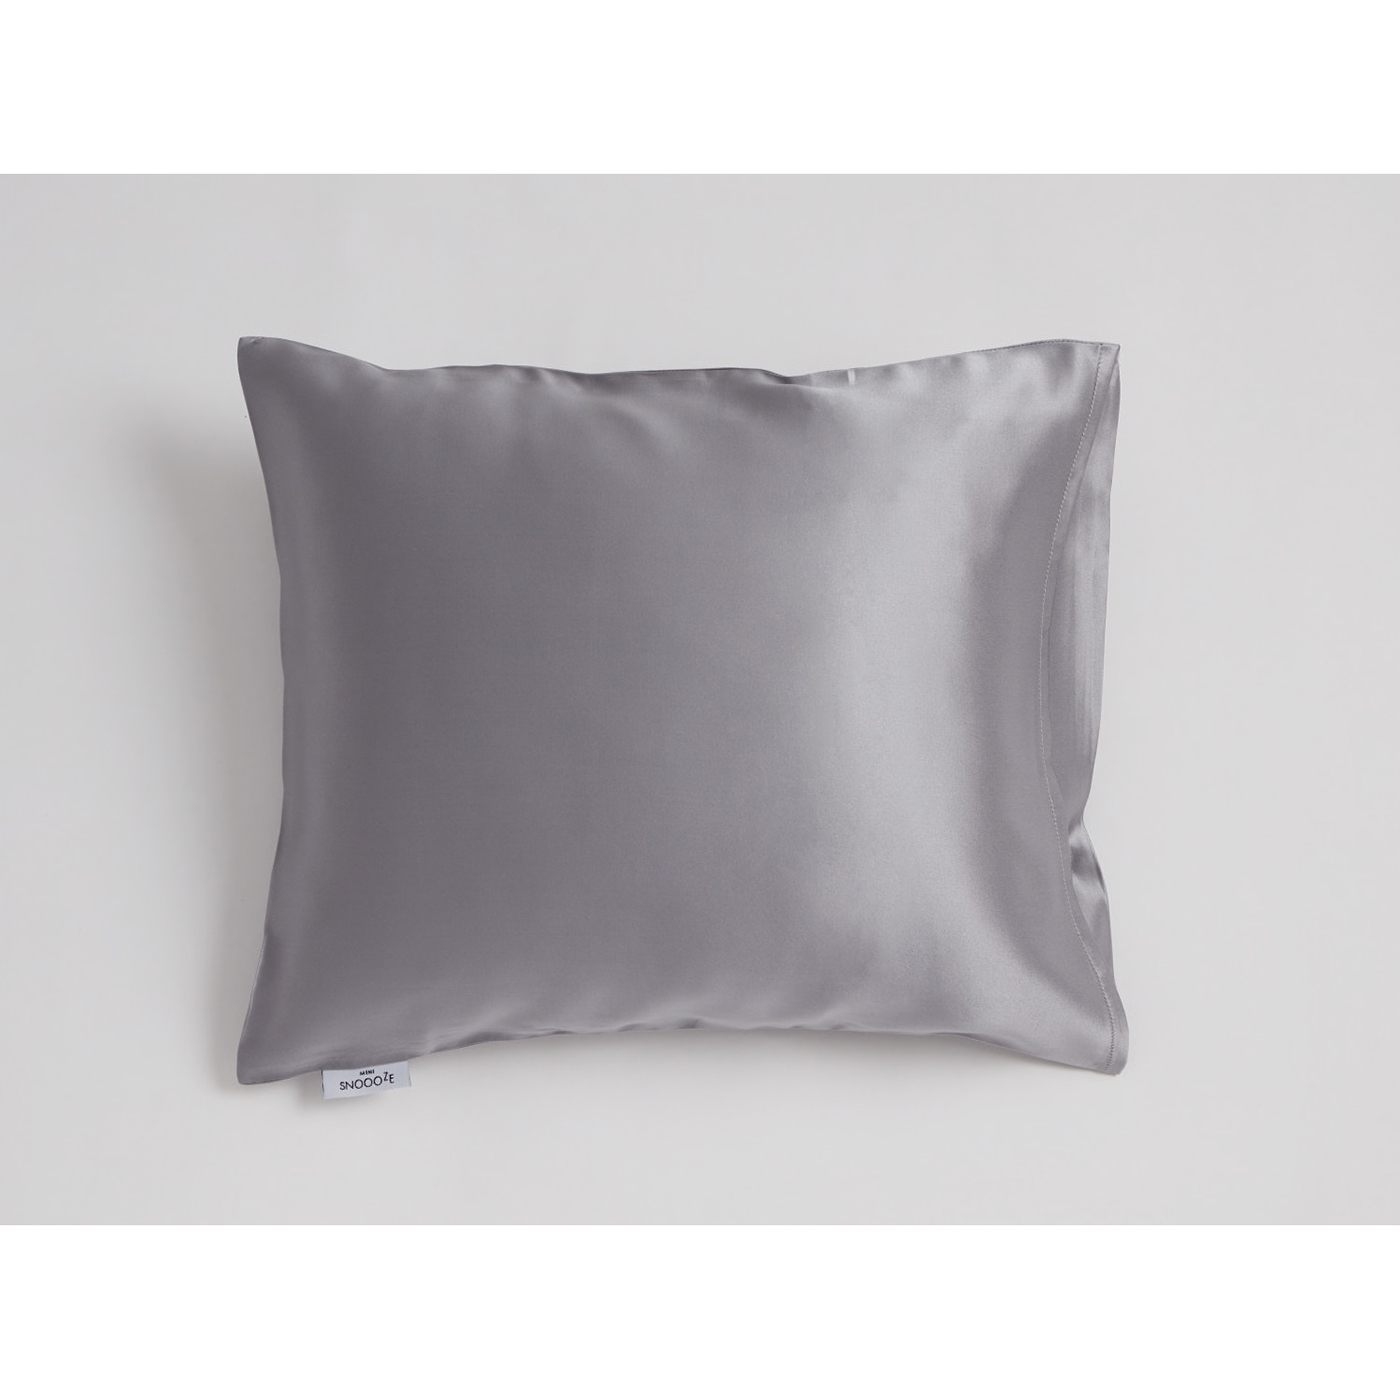 Mini Snoooze grey silk pillowcase